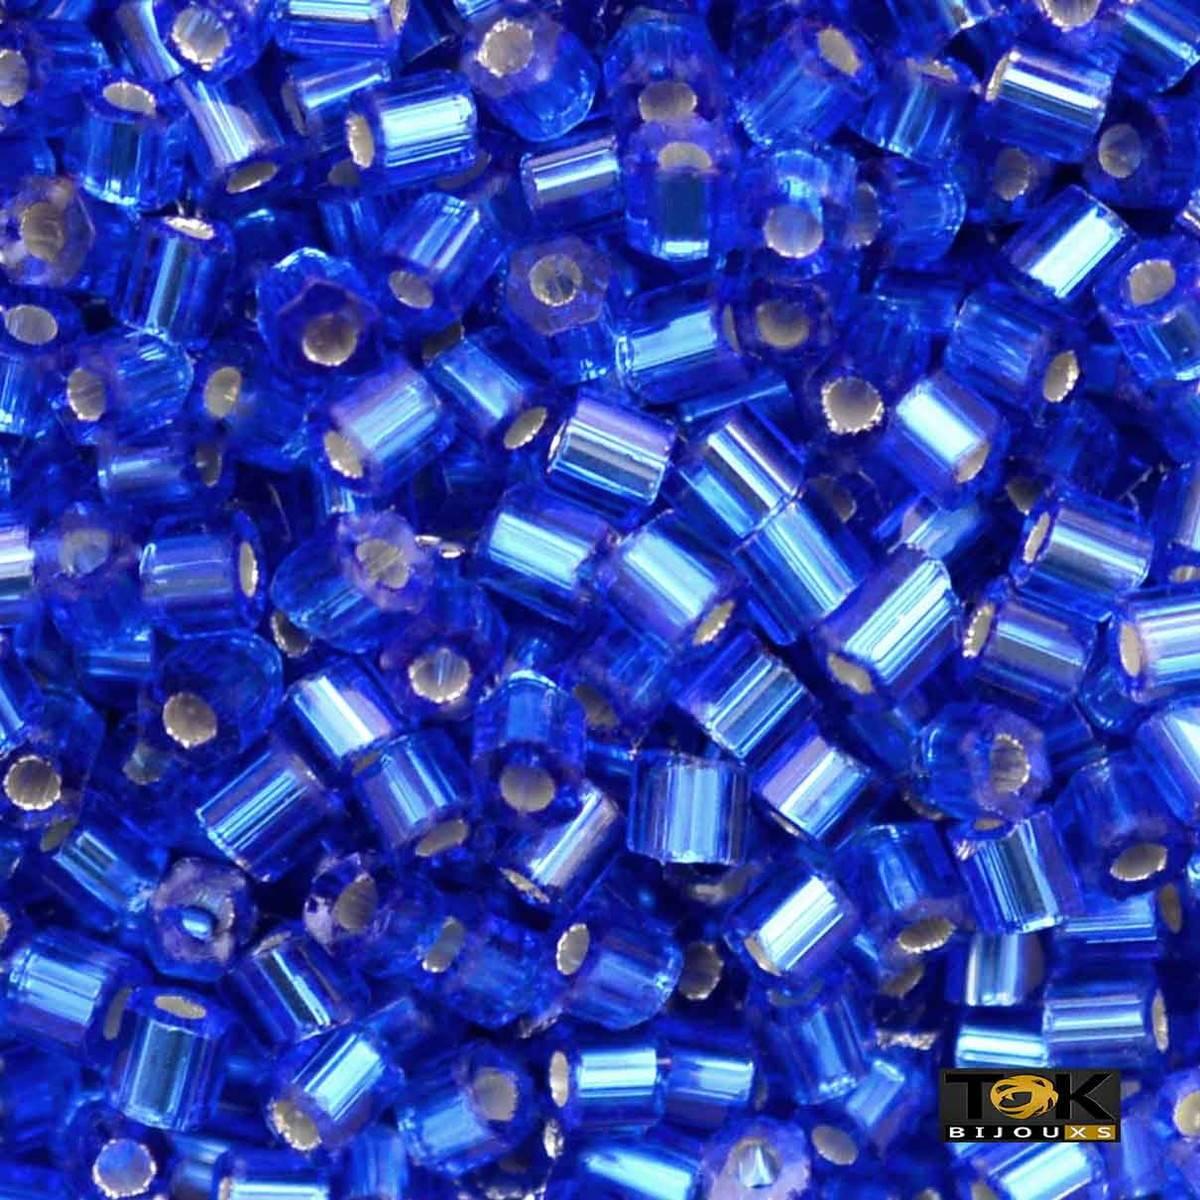 Vidrilho Jablonex Azul Royal Médio Transp. Ref.37050  - 25g